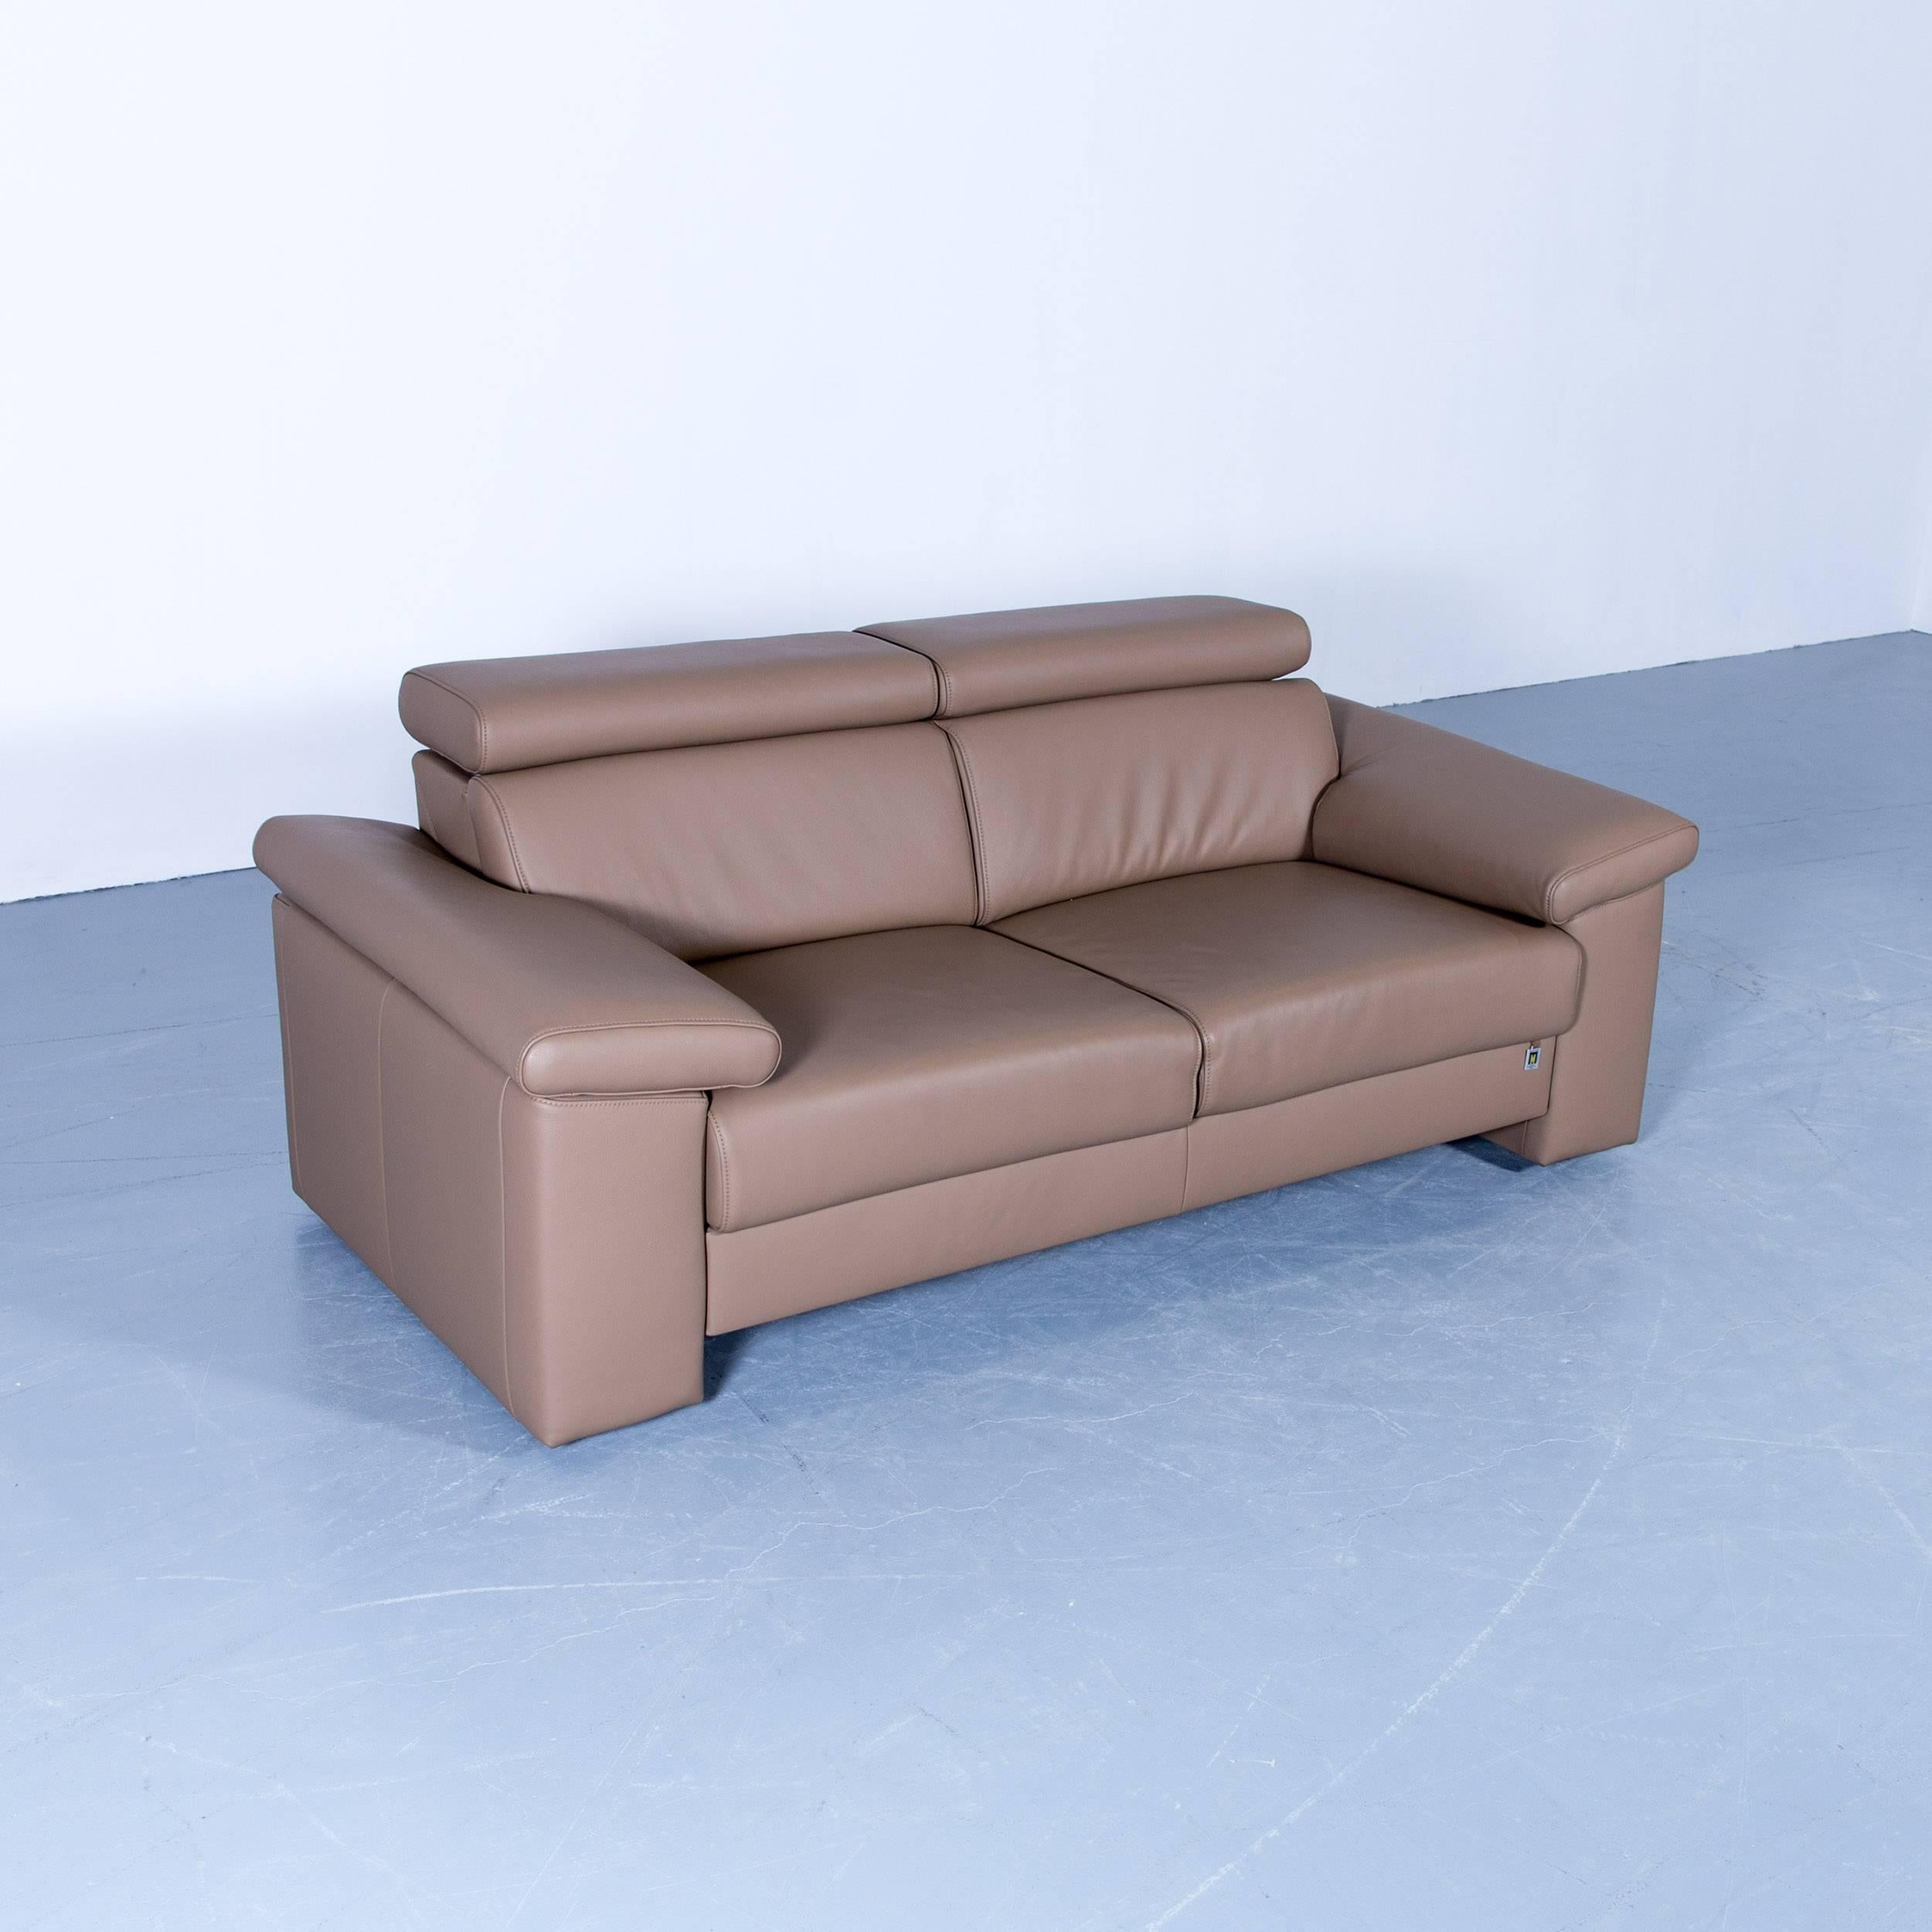 Akau0027dor Designer Sofa, Armchair, Footrest Leather Beige Brown Modern Wood  Feet In